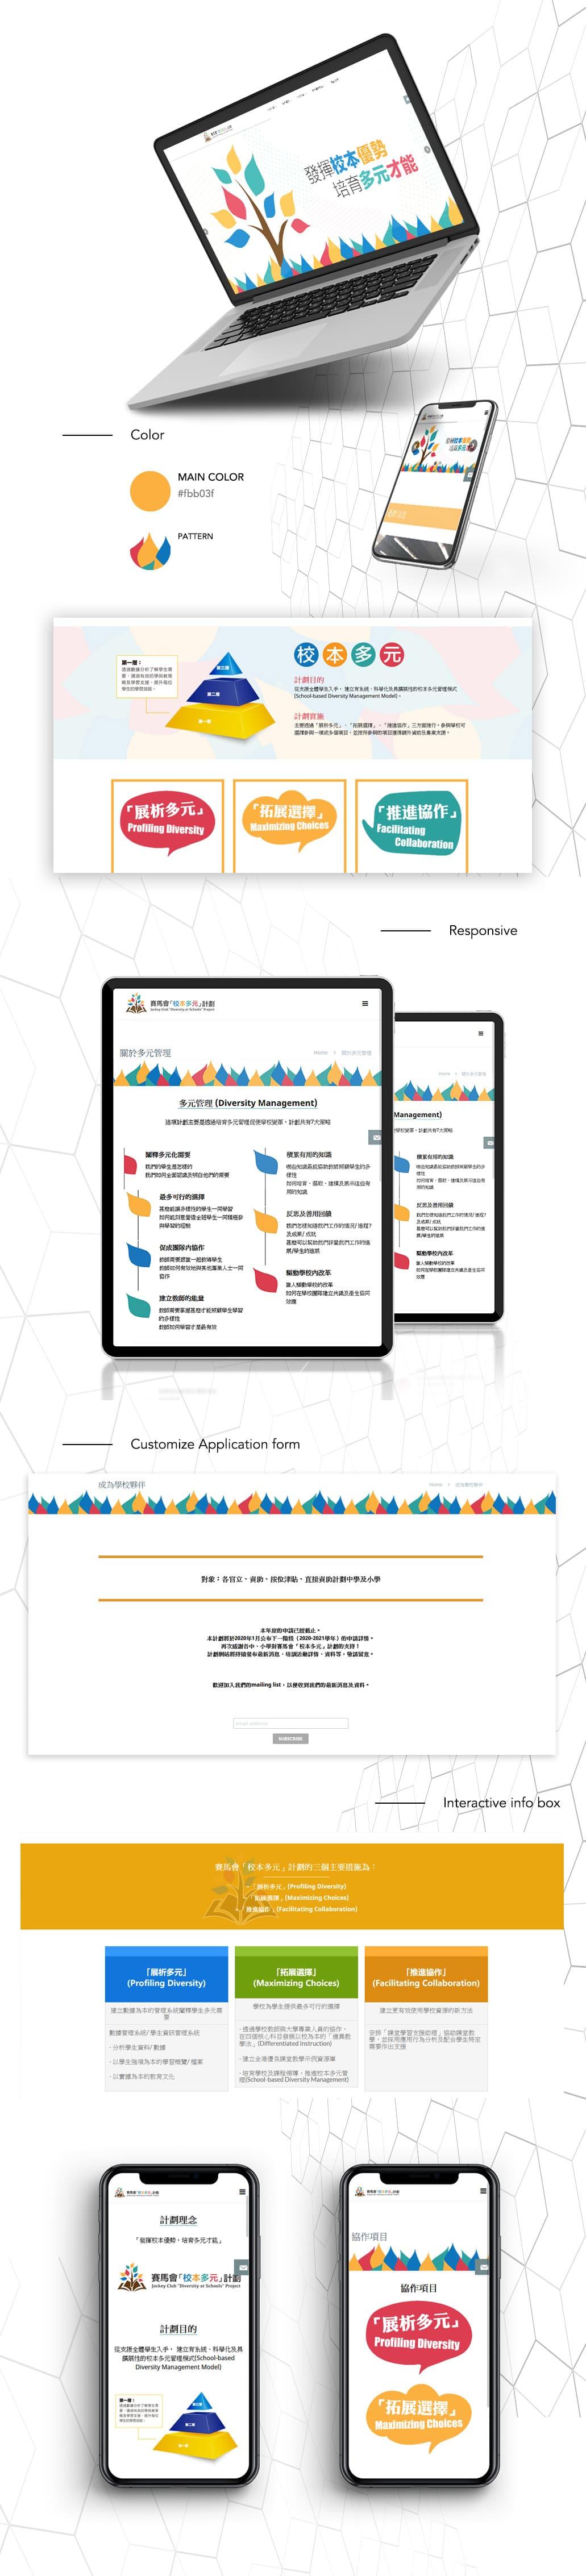 Hong Kong education web design